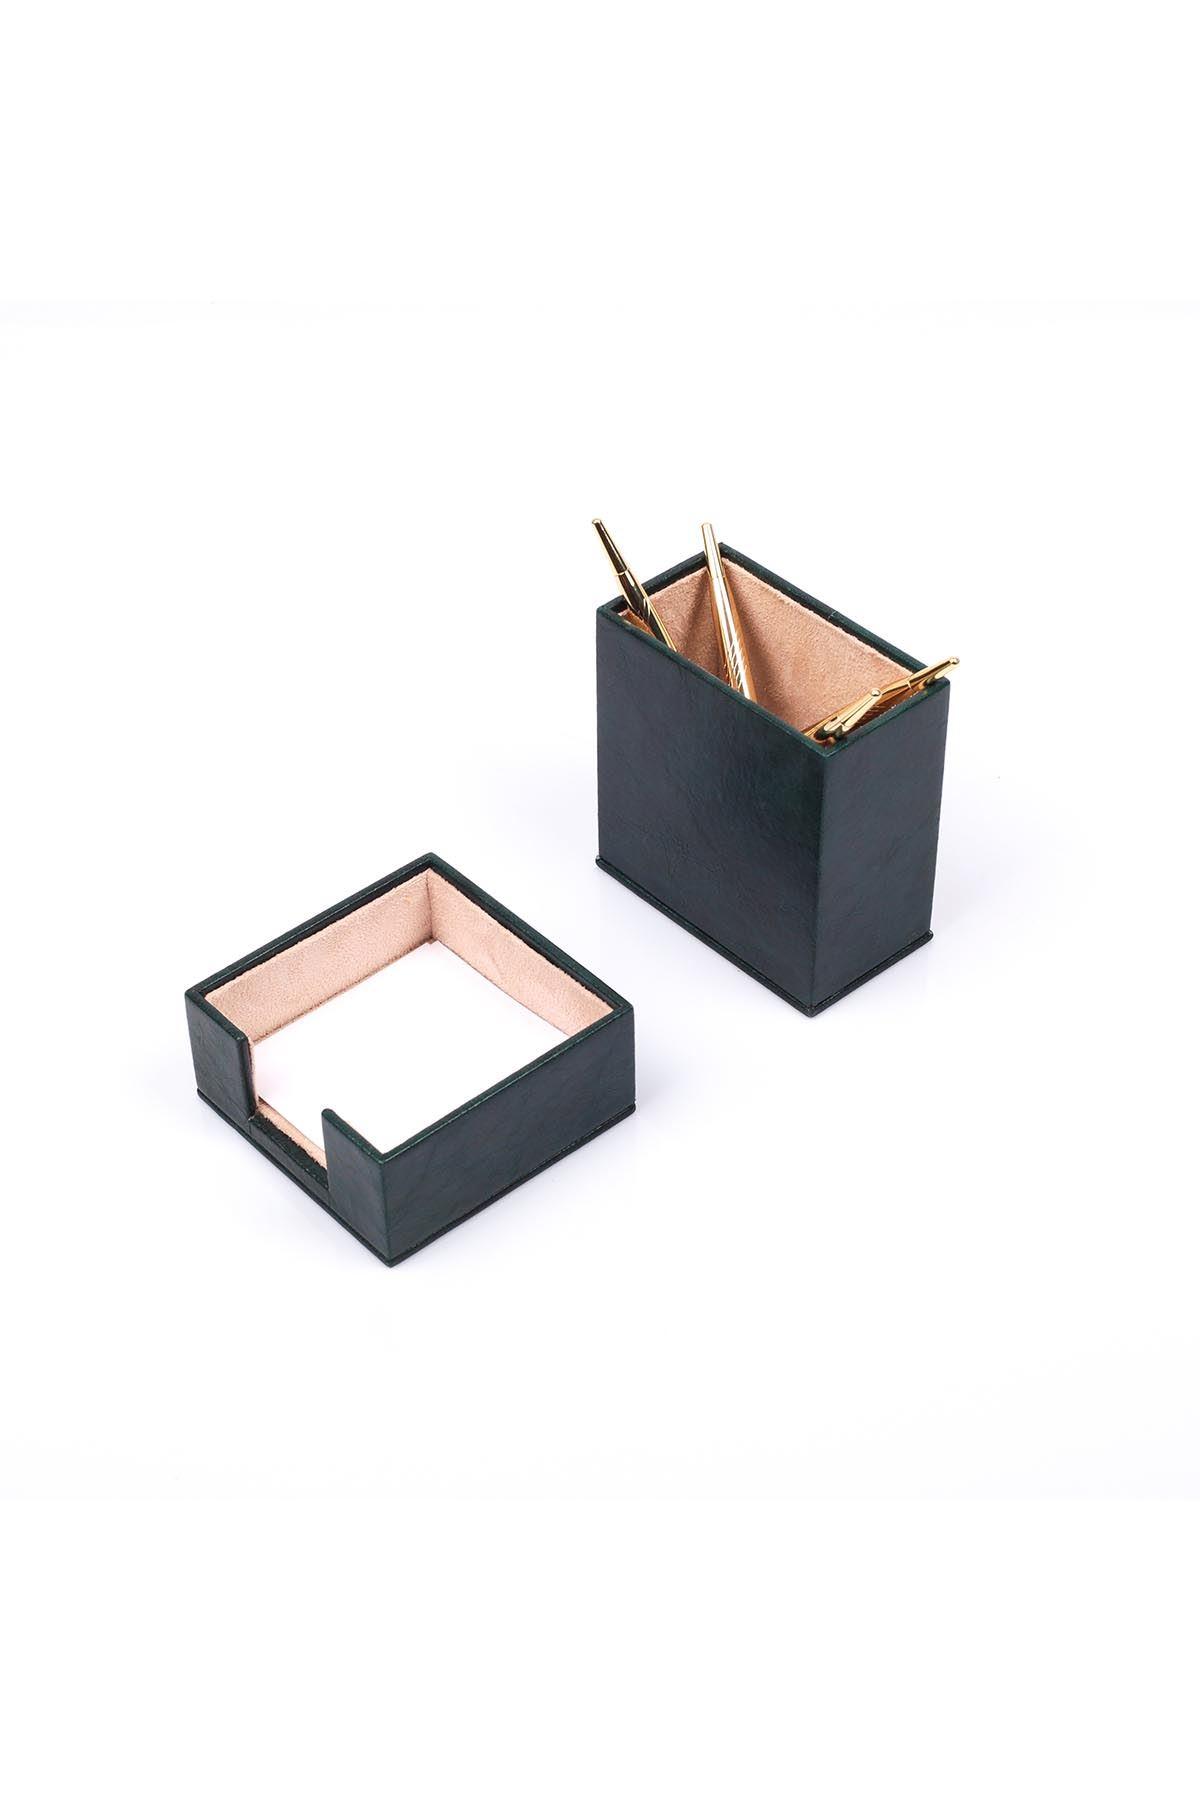 Leather Desk Accessories set of 2 Green| Desk Set Accessories | Desktop Accessories | Desk Accessories | Desk Organizers